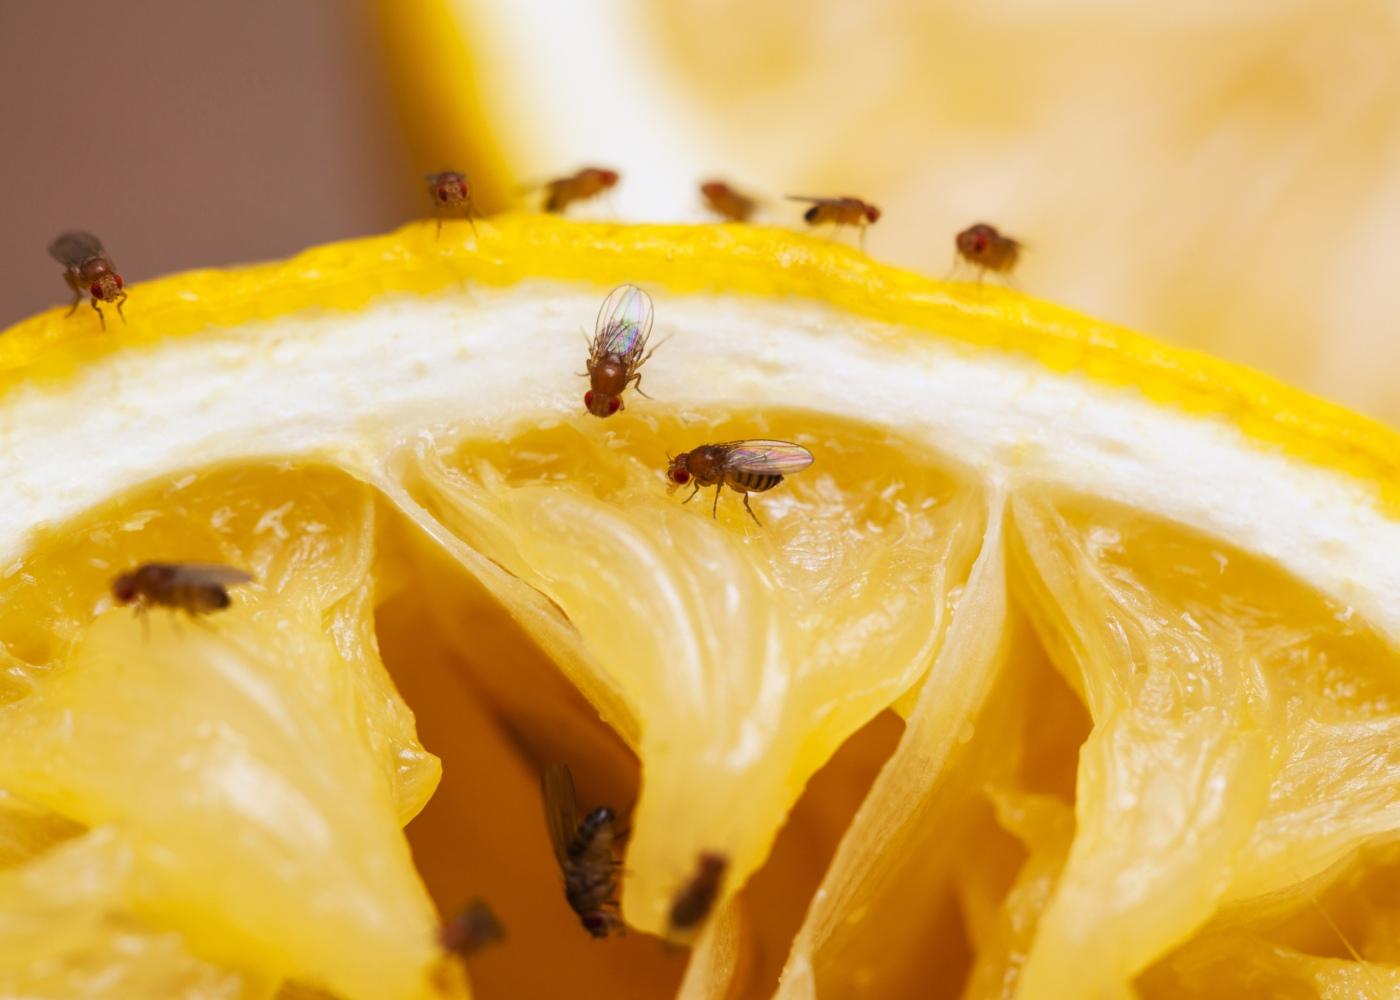 moscas na fruta